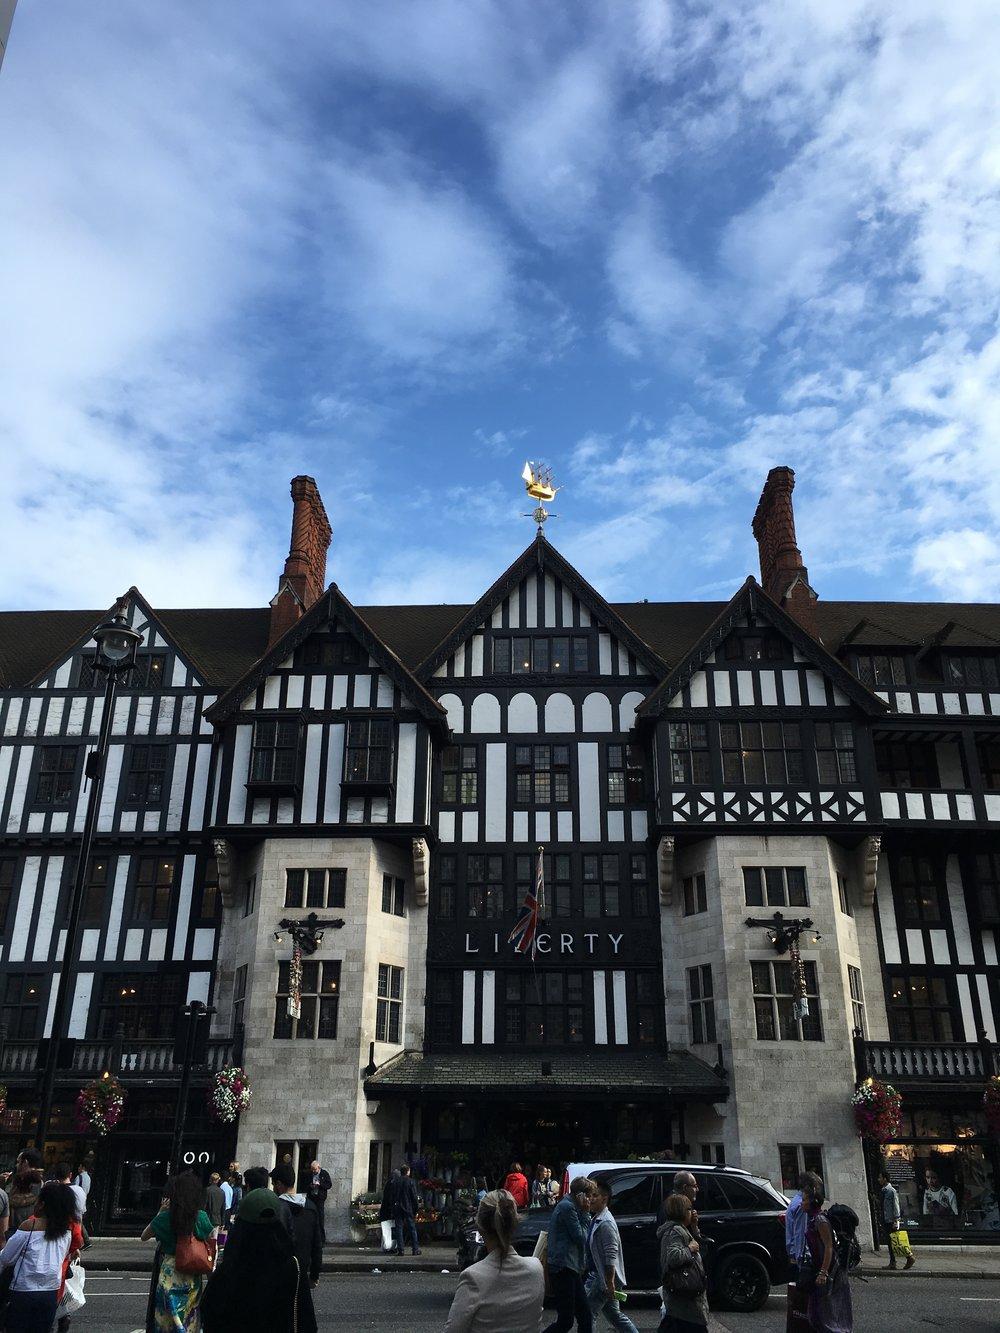 Grand hotel du palais royal paris black tomato - Liberty London